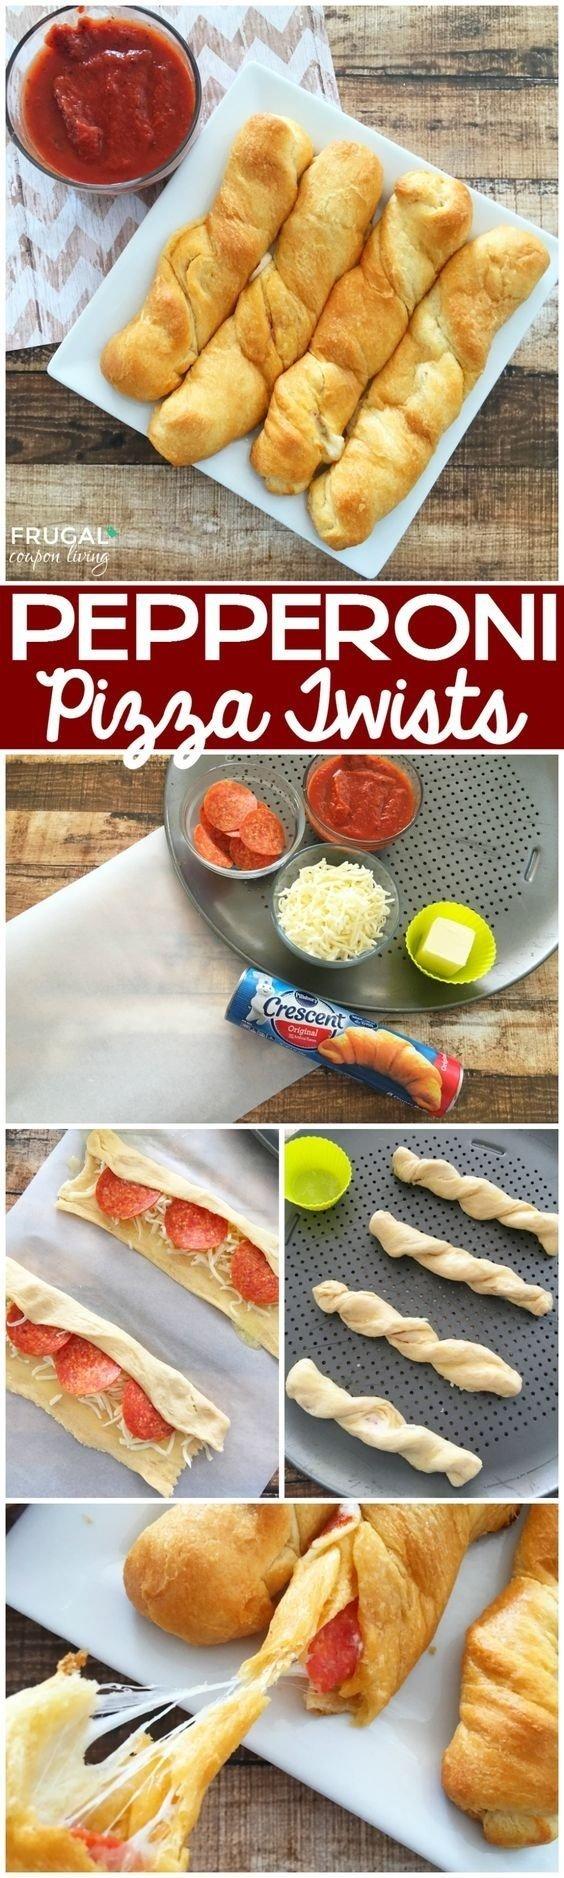 10 Stylish Good Dinner Ideas For Kids 319 best cool kid food images on pinterest toddler snacks baby 1 2020